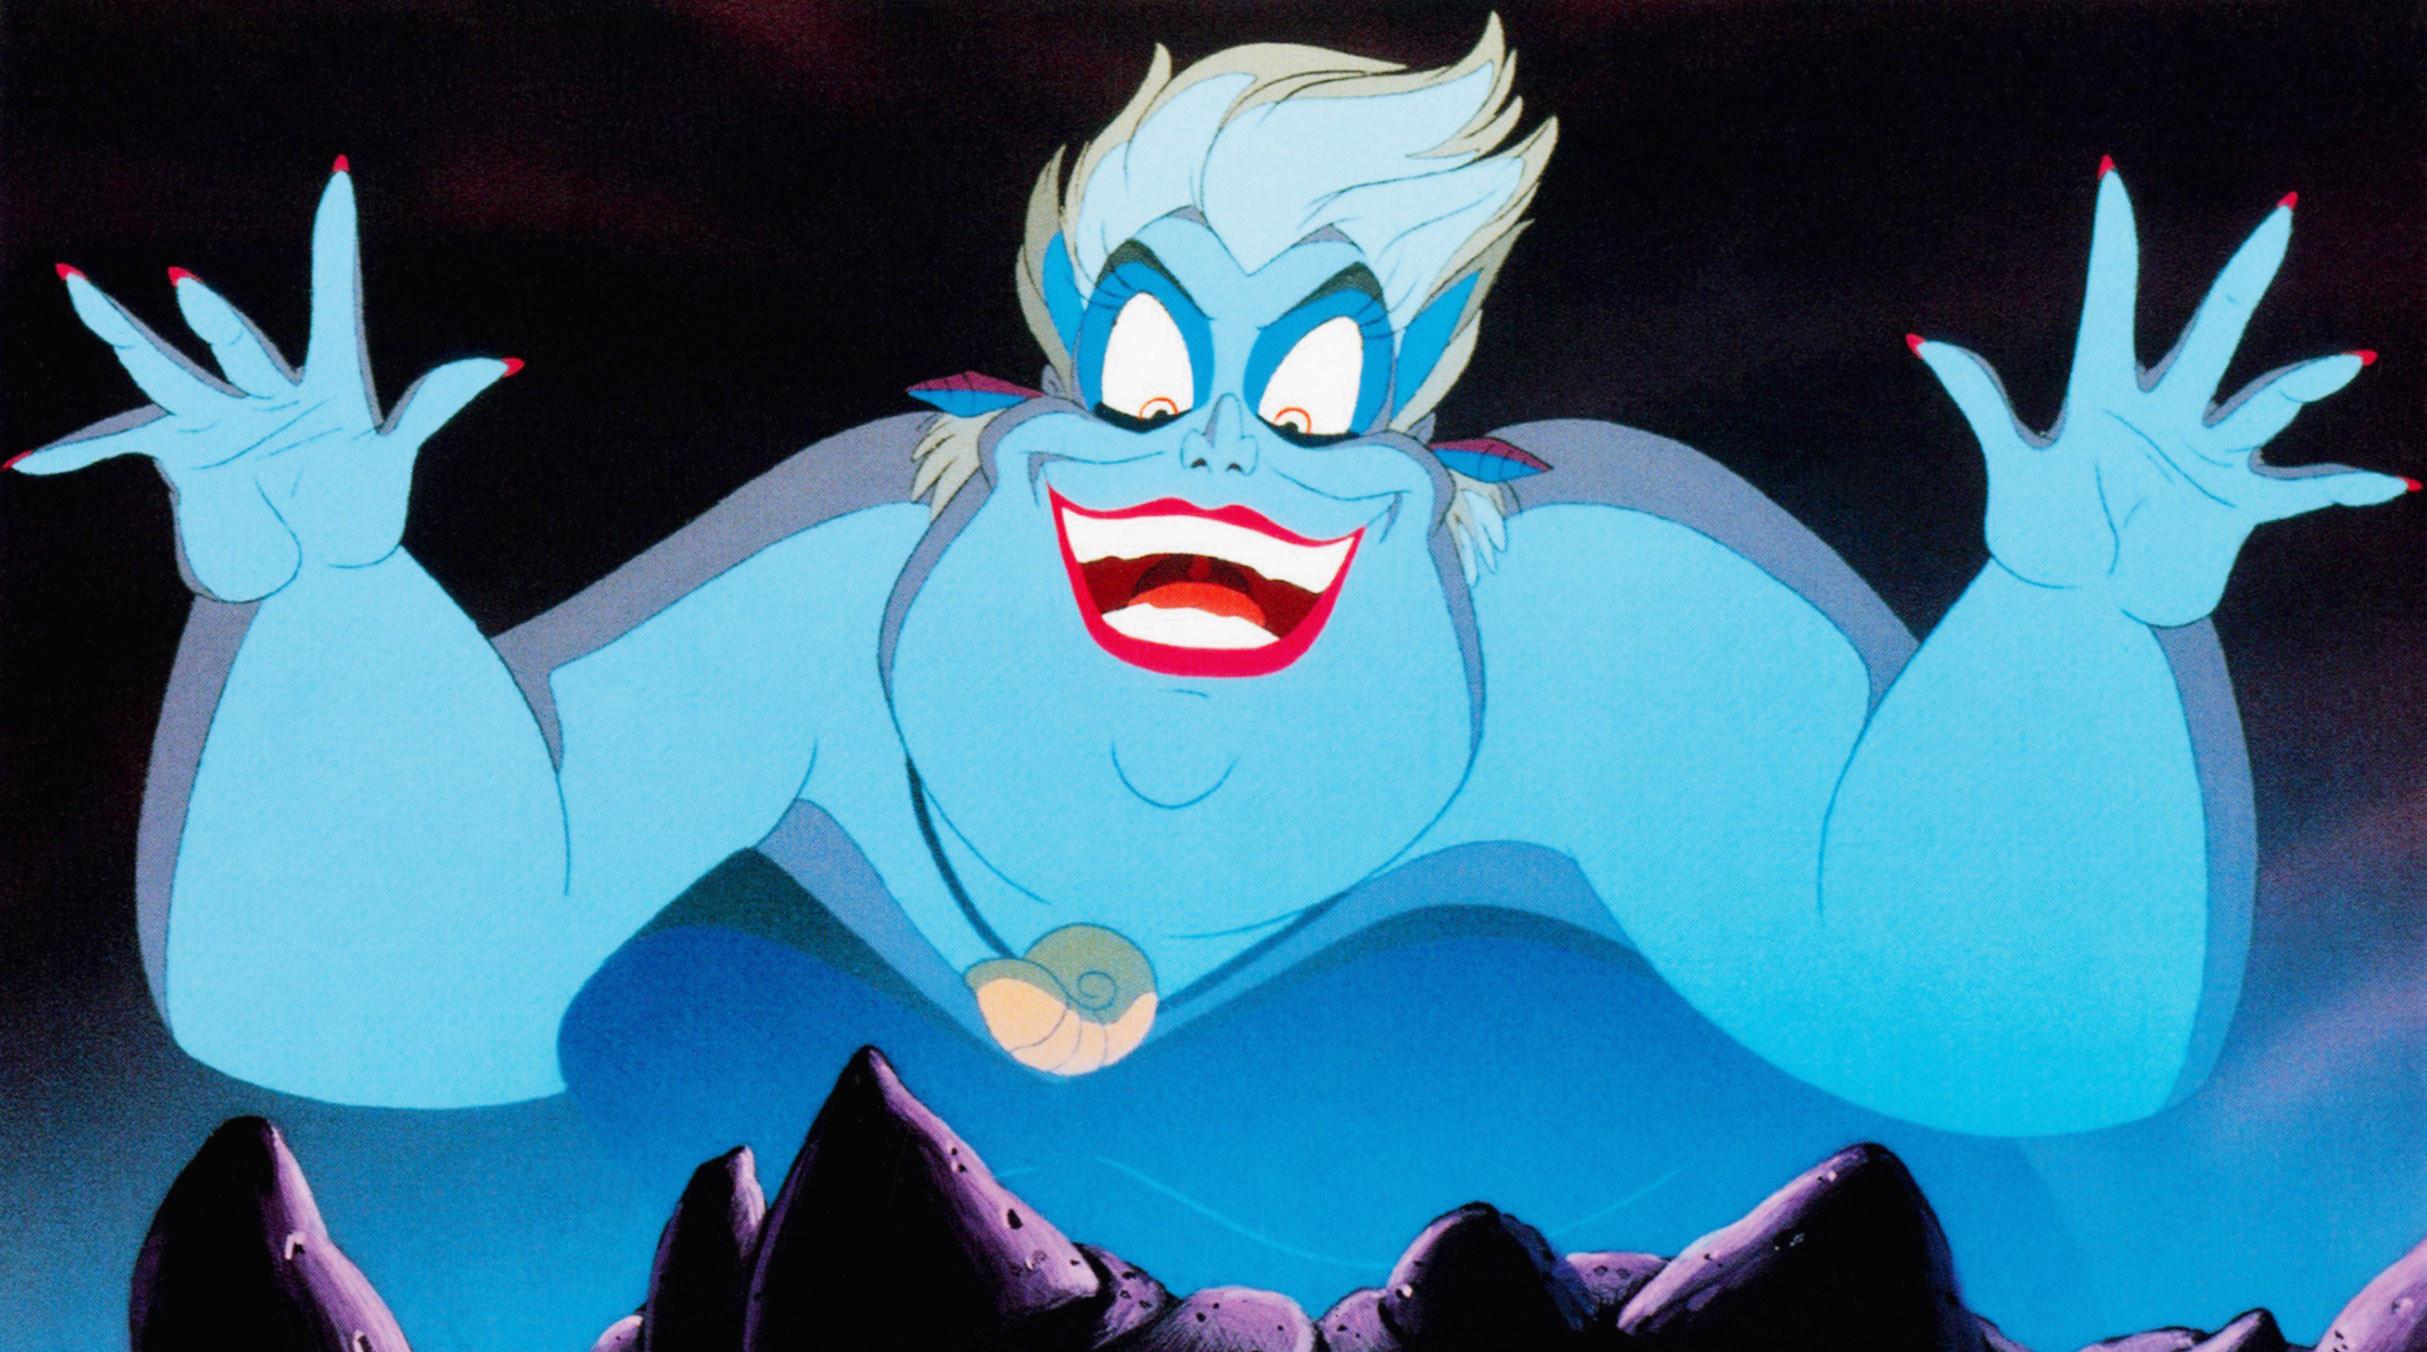 Ursula sings in blue light